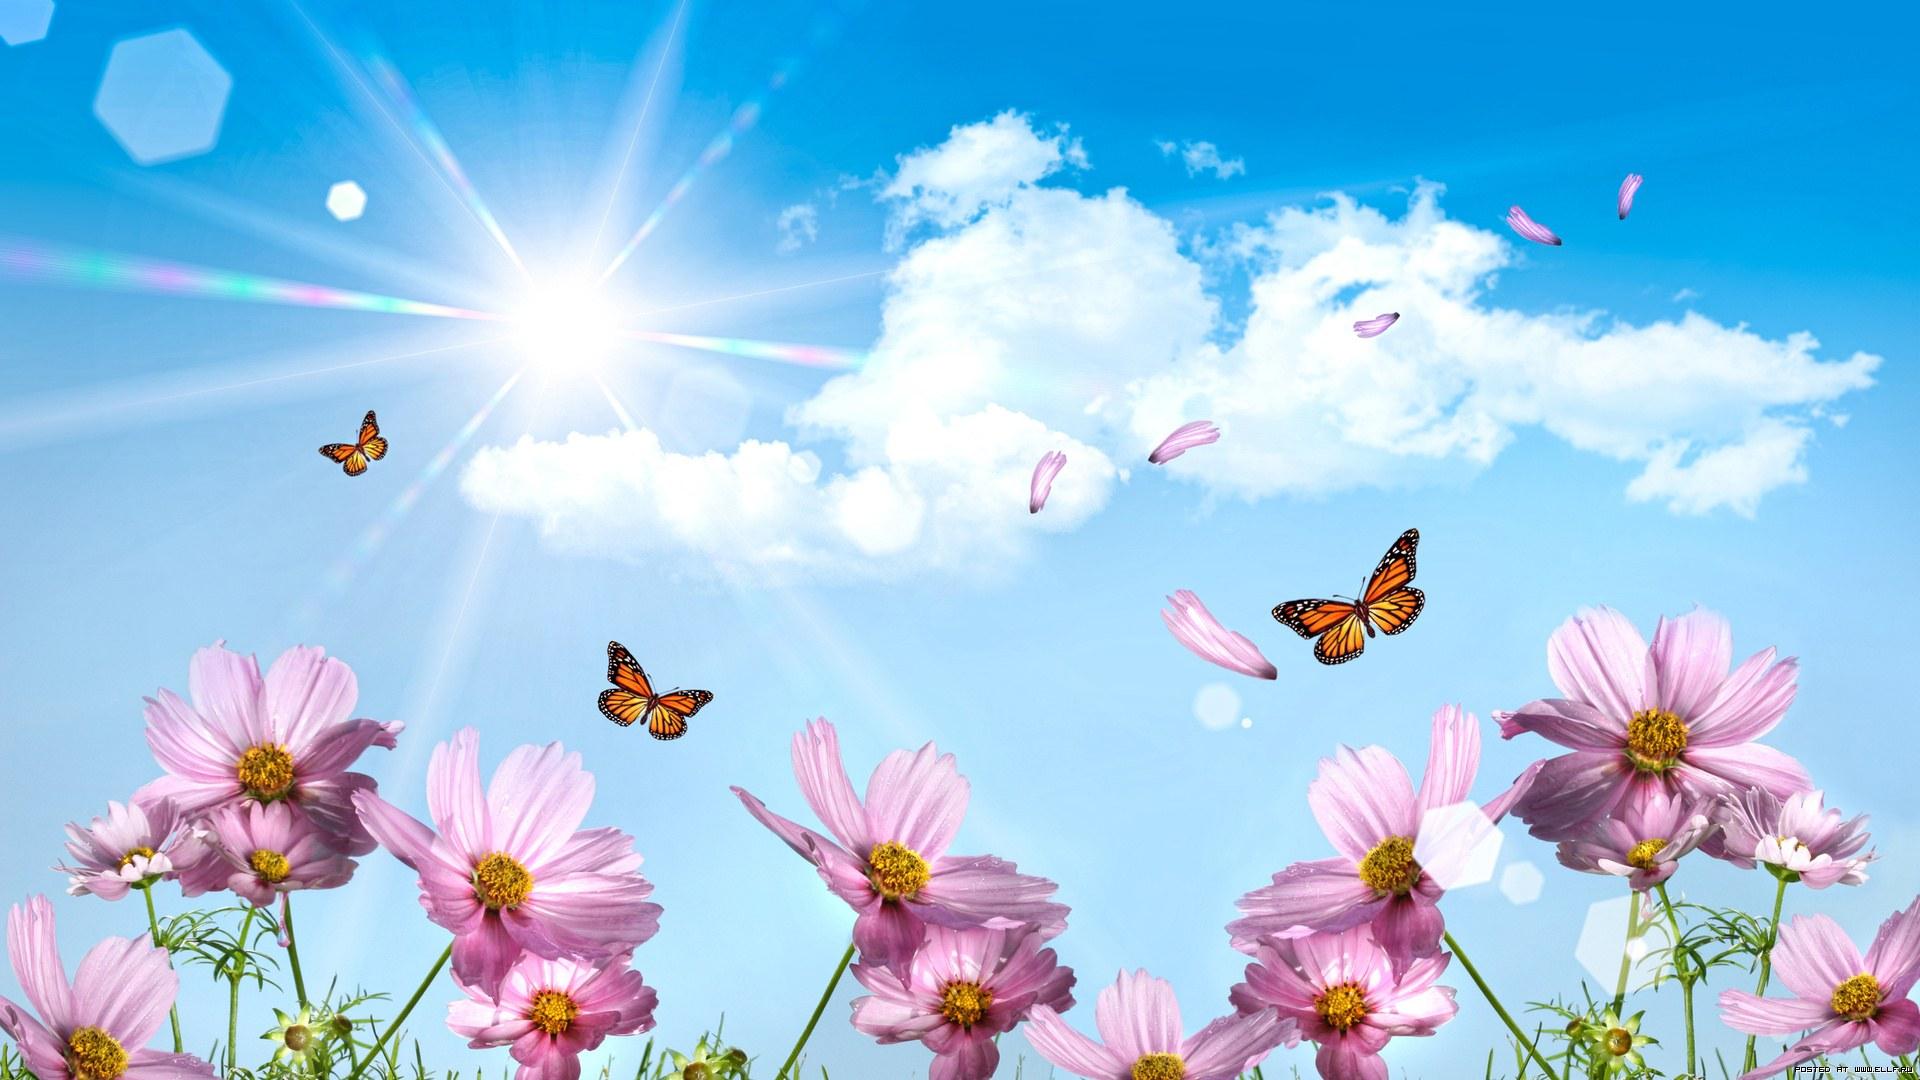 бабочки в цветах обои на рабочий стол